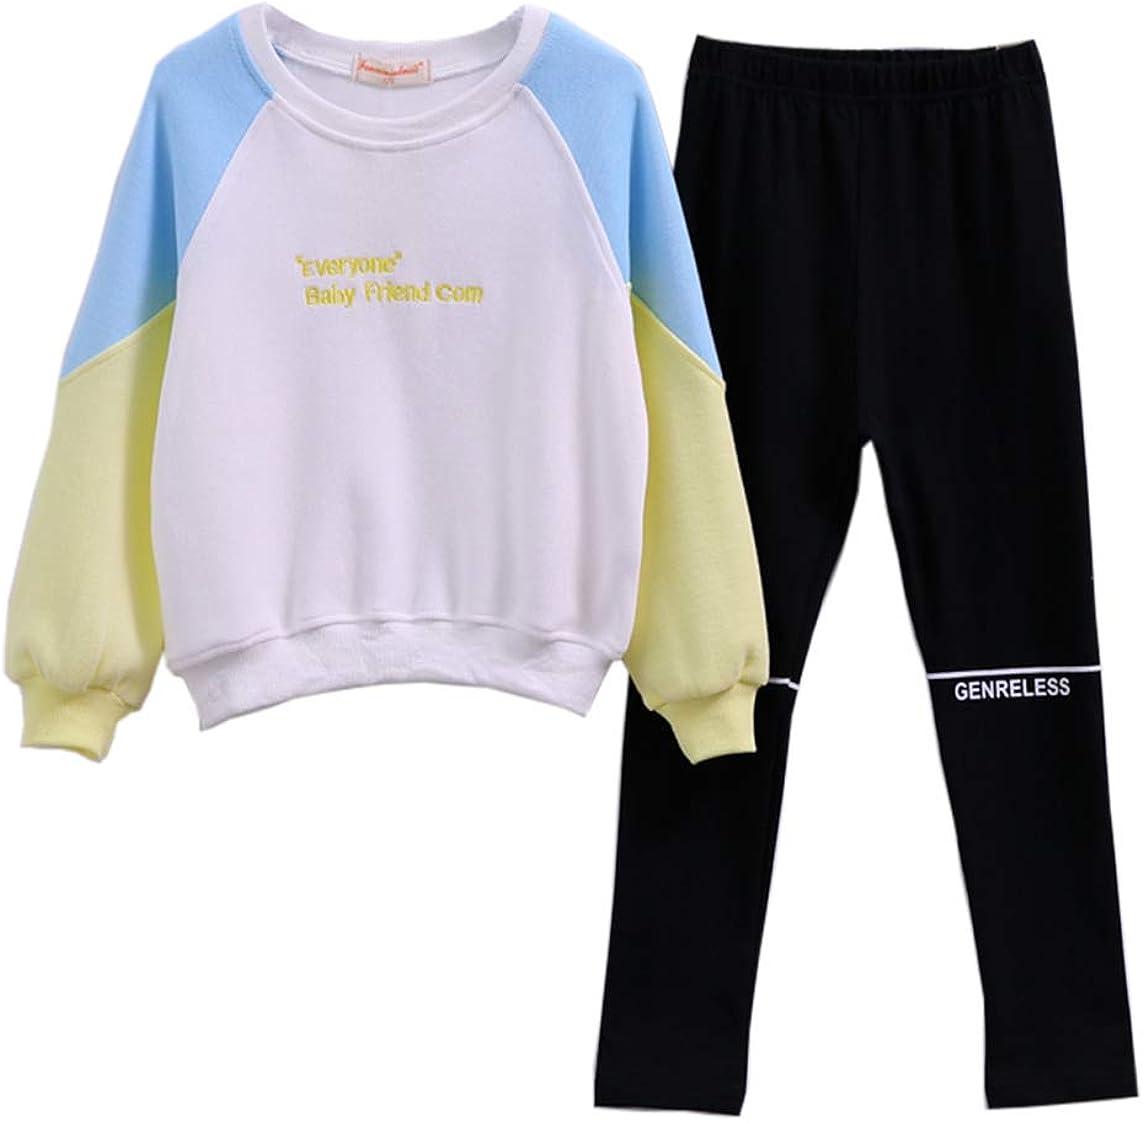 Little Max 86% OFF Girls' Kids 2 Pieces Long Top Leggings Sleeve San Antonio Mall Pants Cloth